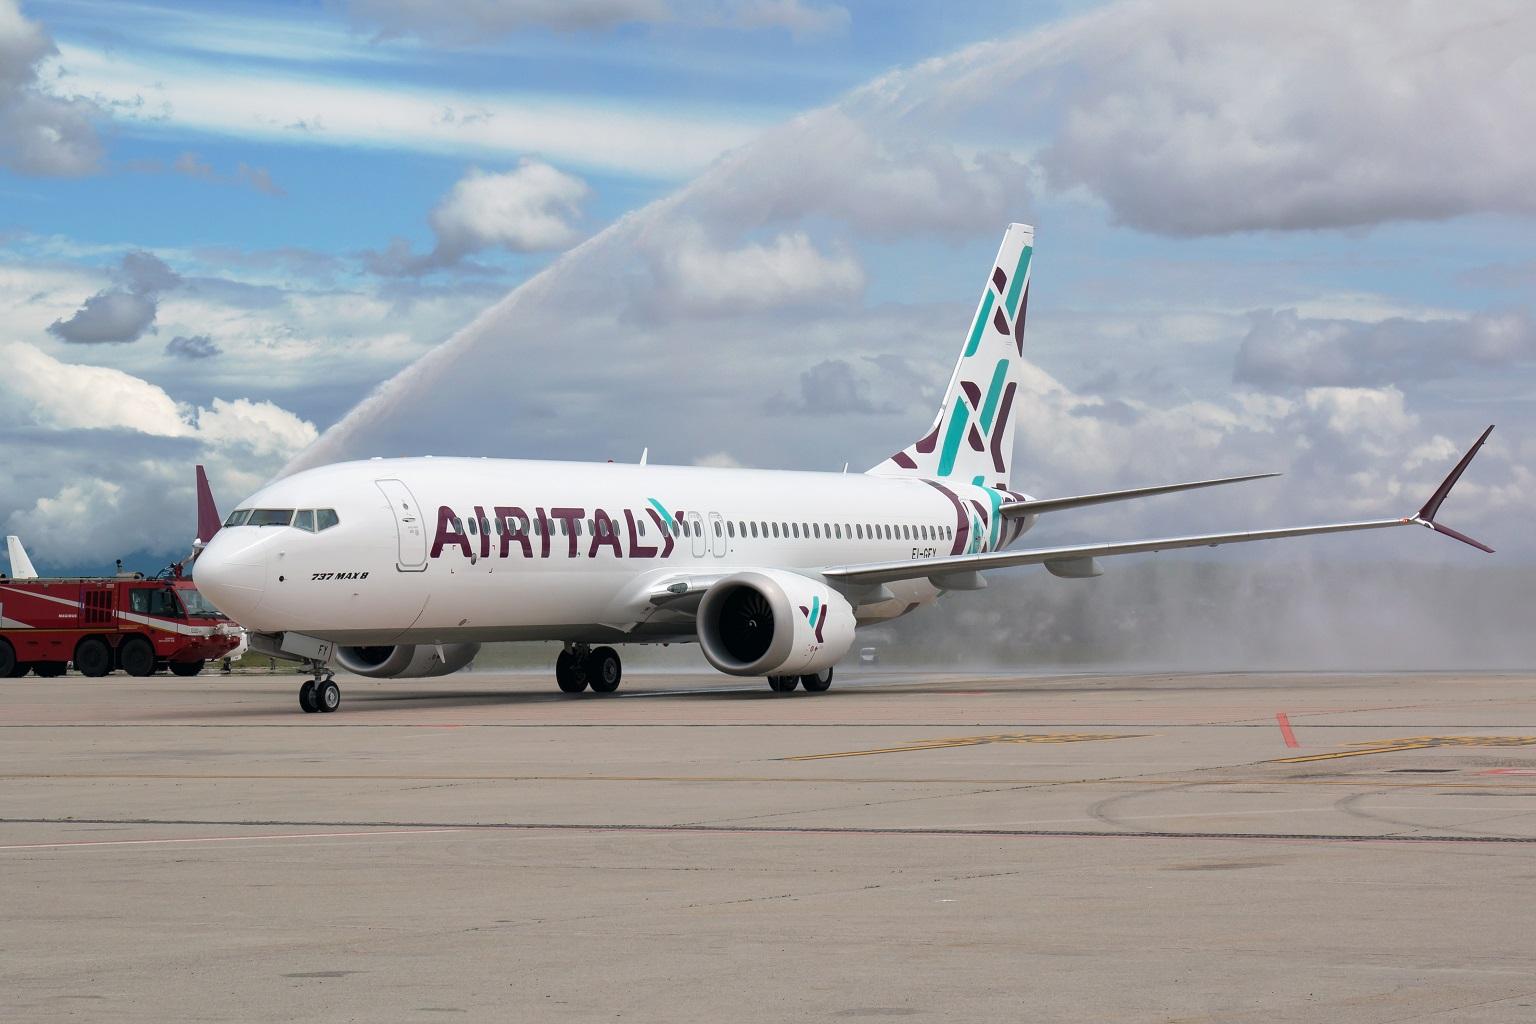 Air Italy cigs